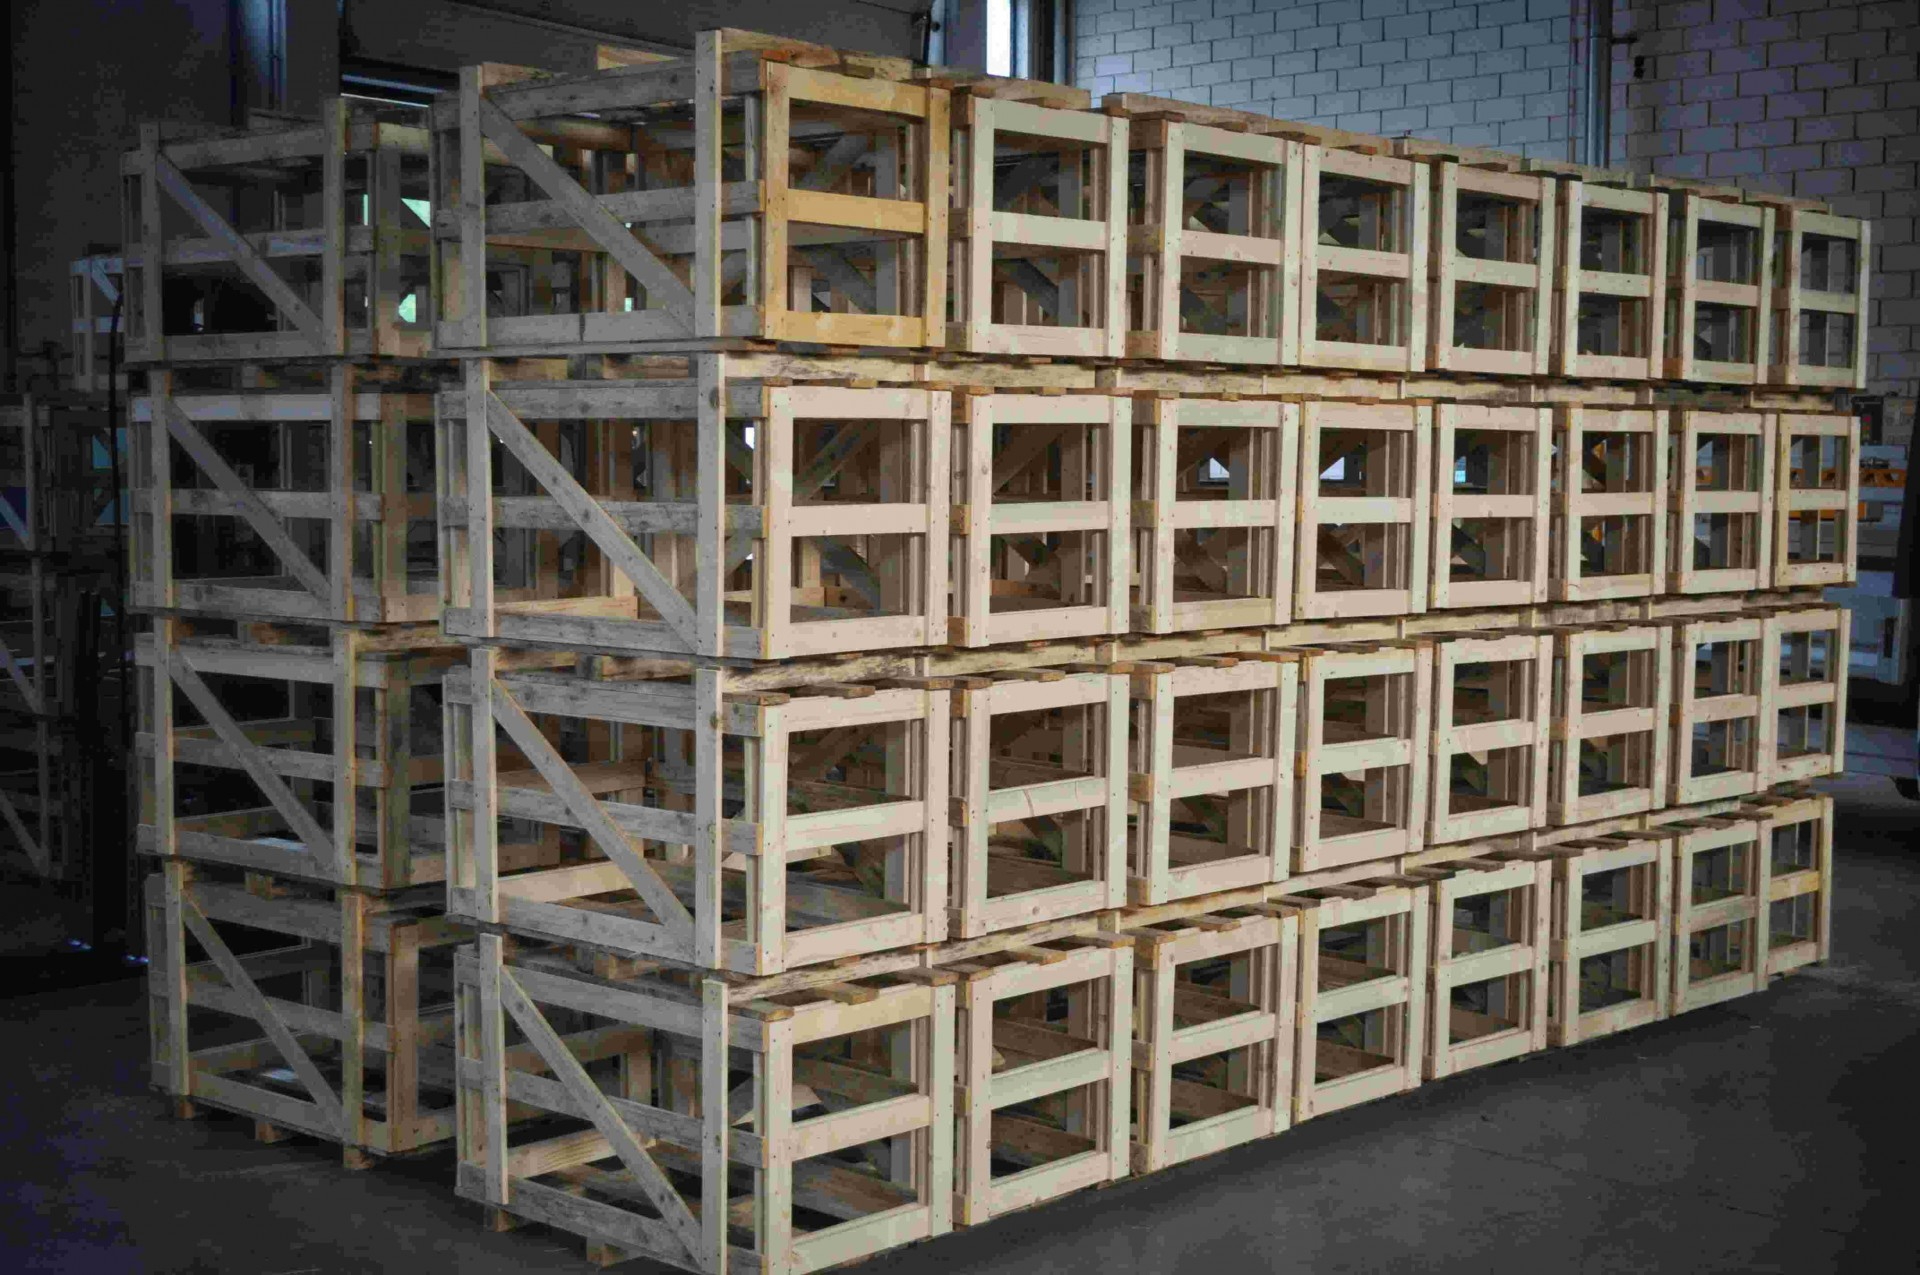 no-carico-casse-da-container-compressed.jpg